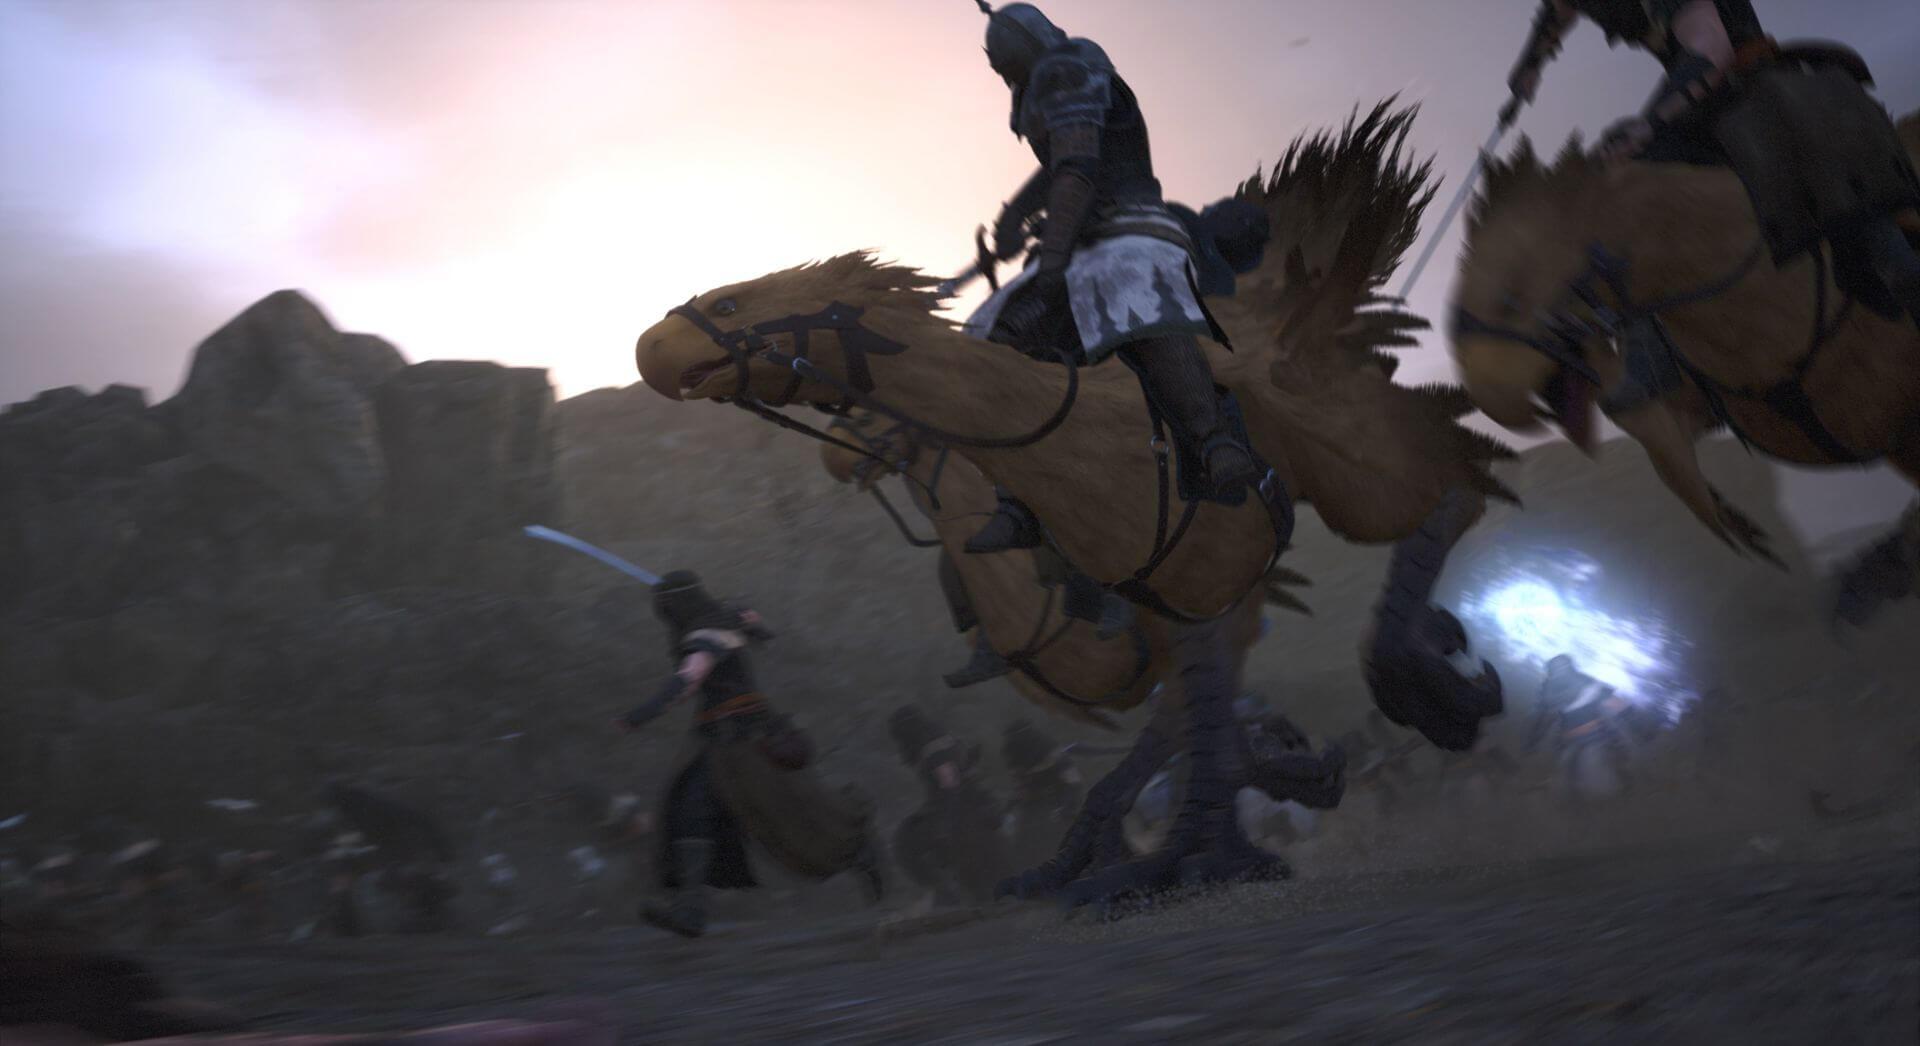 Chocobo Final Fantasy XVI anteprima